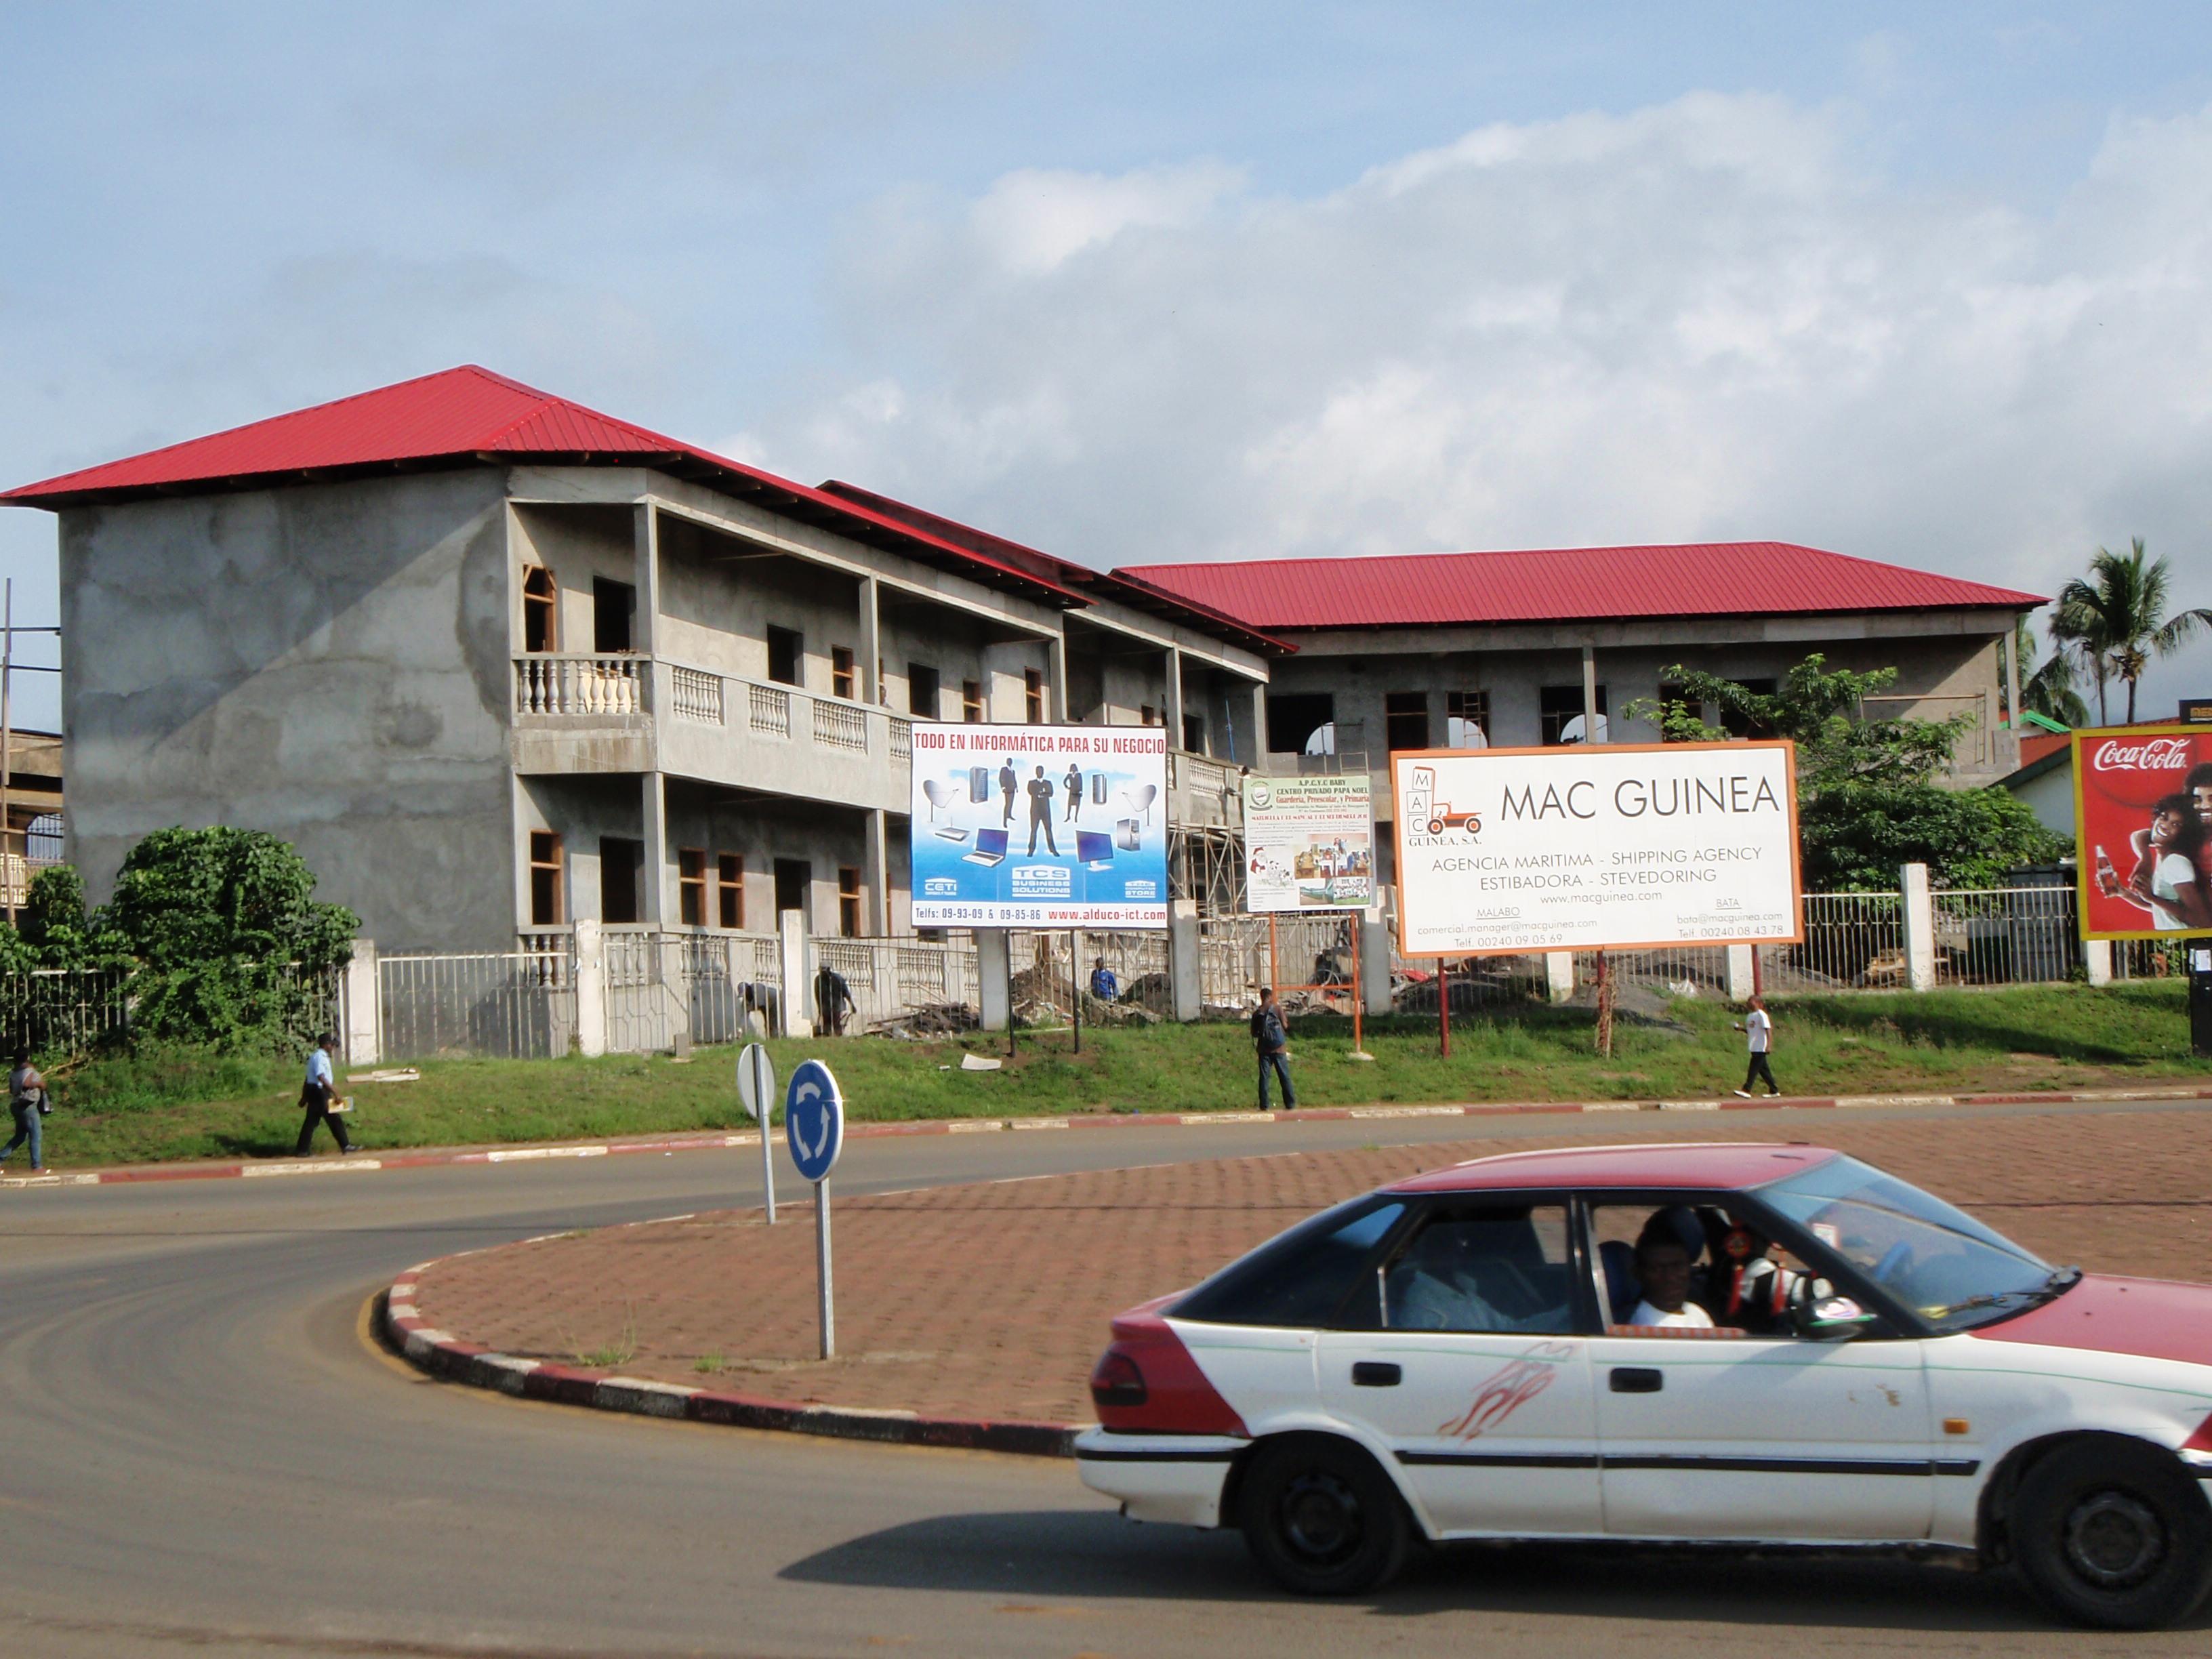 Roundabout; Malabo, Equatorial Guinea; 2010